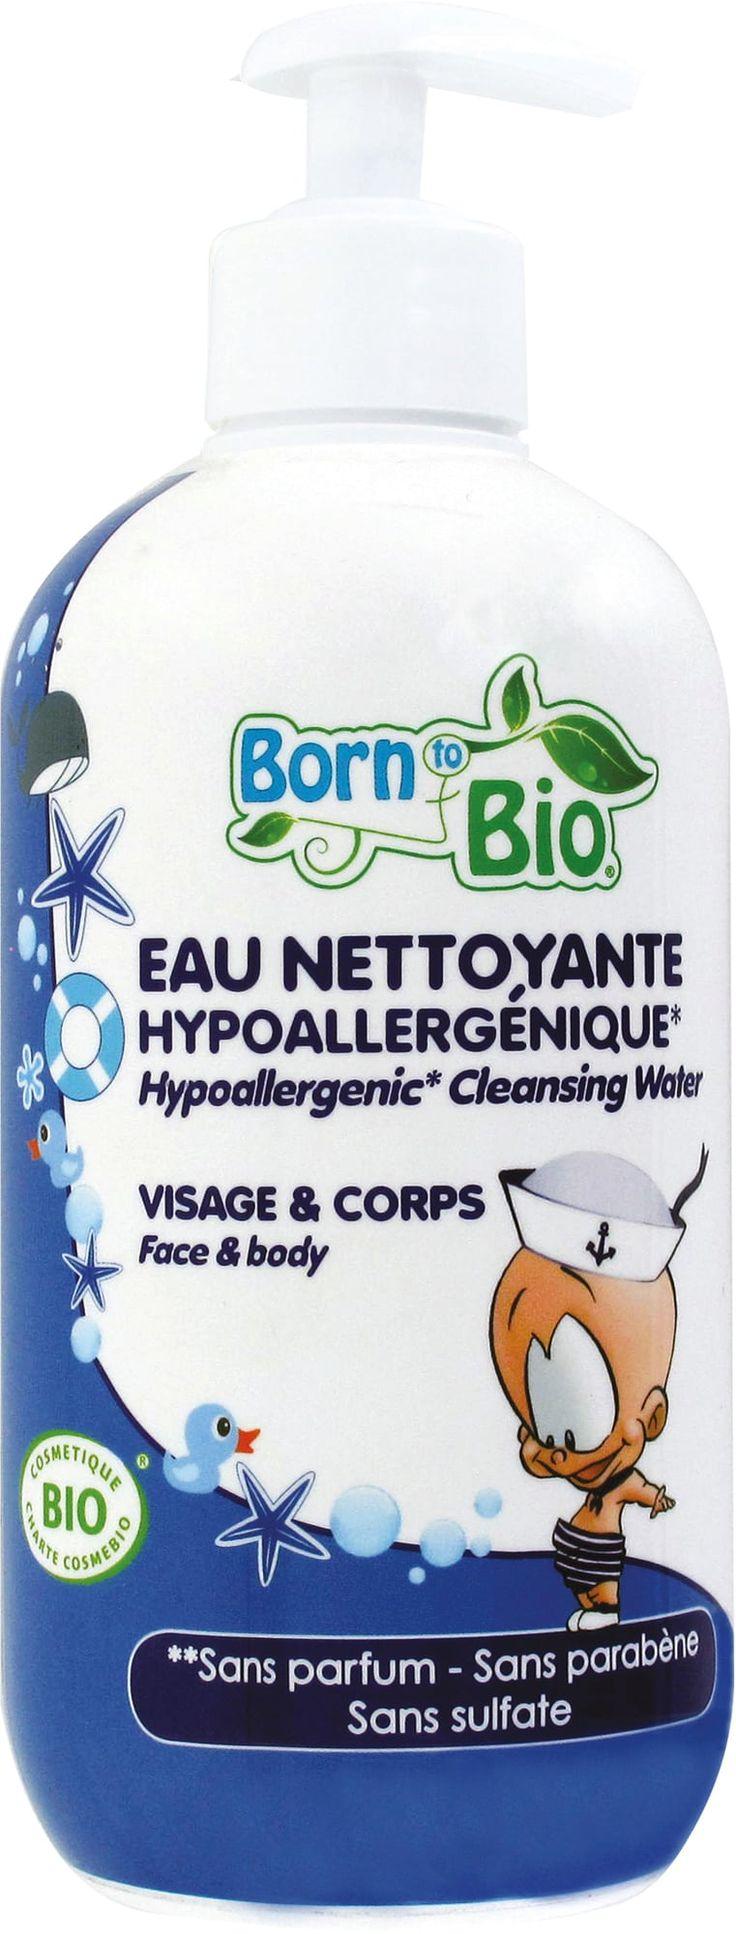 Born to Bio Organic Baby čistilna voda + pumpica - 500 ml